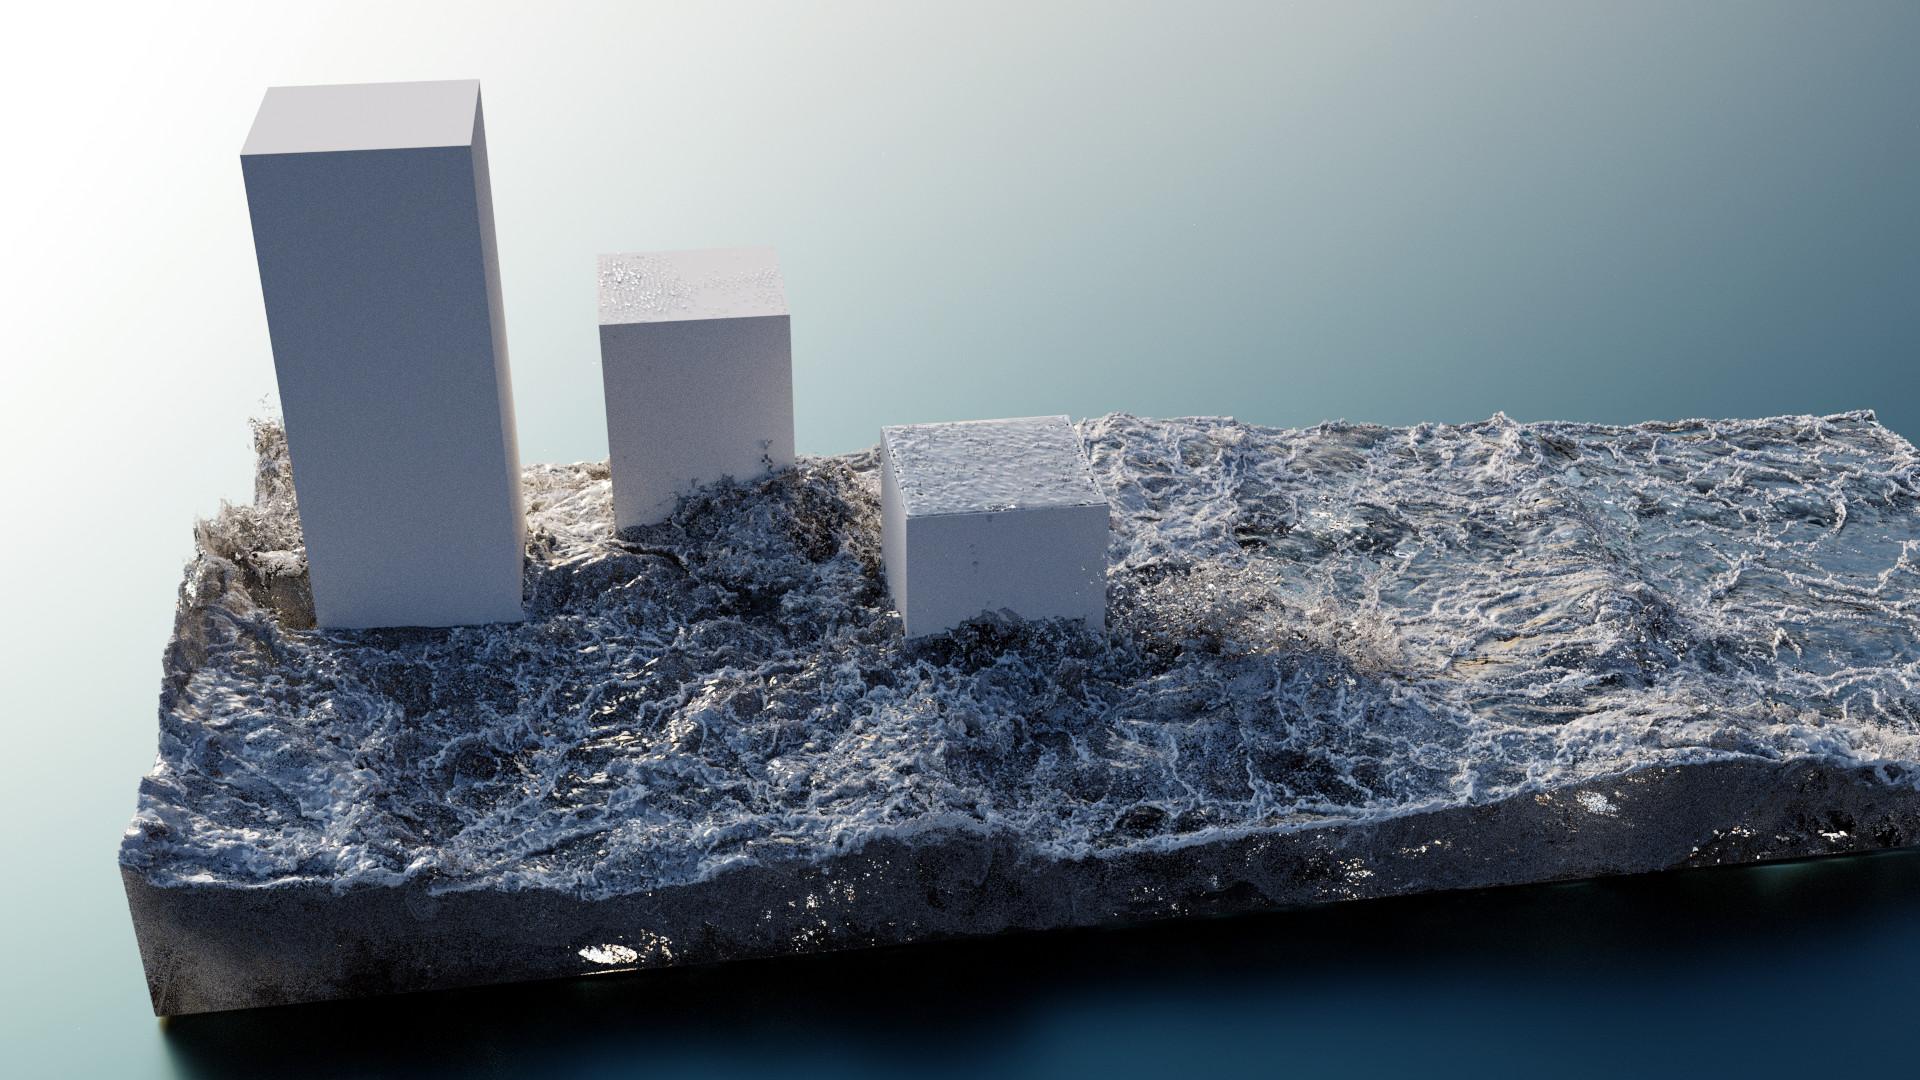 FLIP Fluids Addon: A liquid fluid simulation tool for Blender